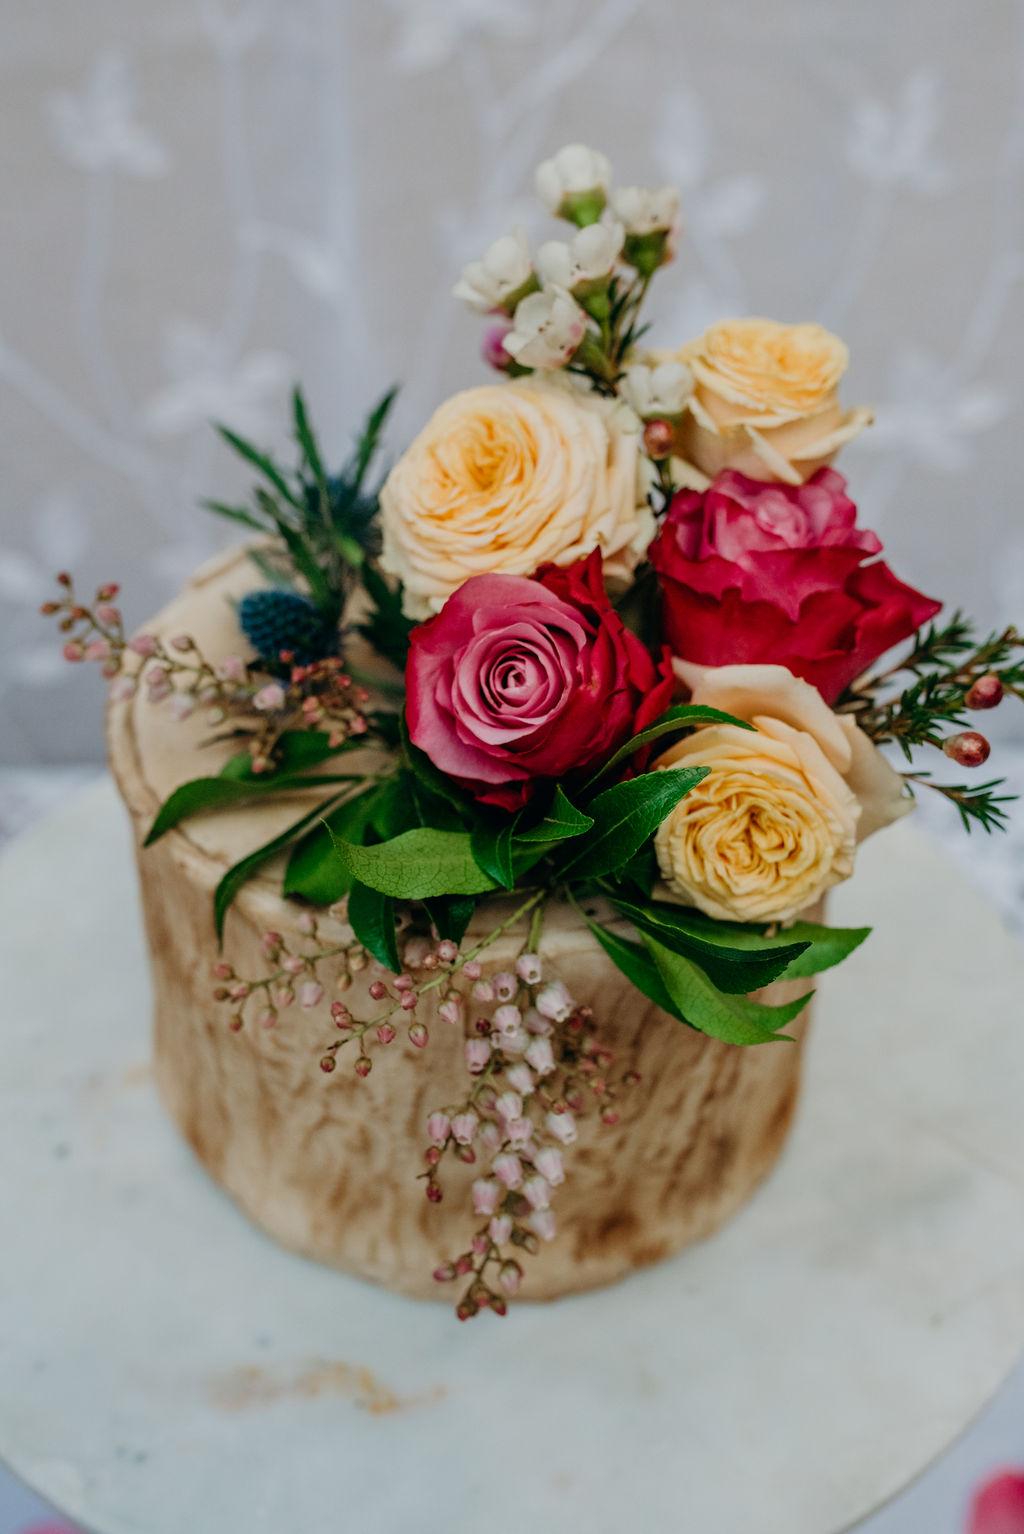 natural, cake, looks like a log, magic, harrie's creations, flowers, beautiful